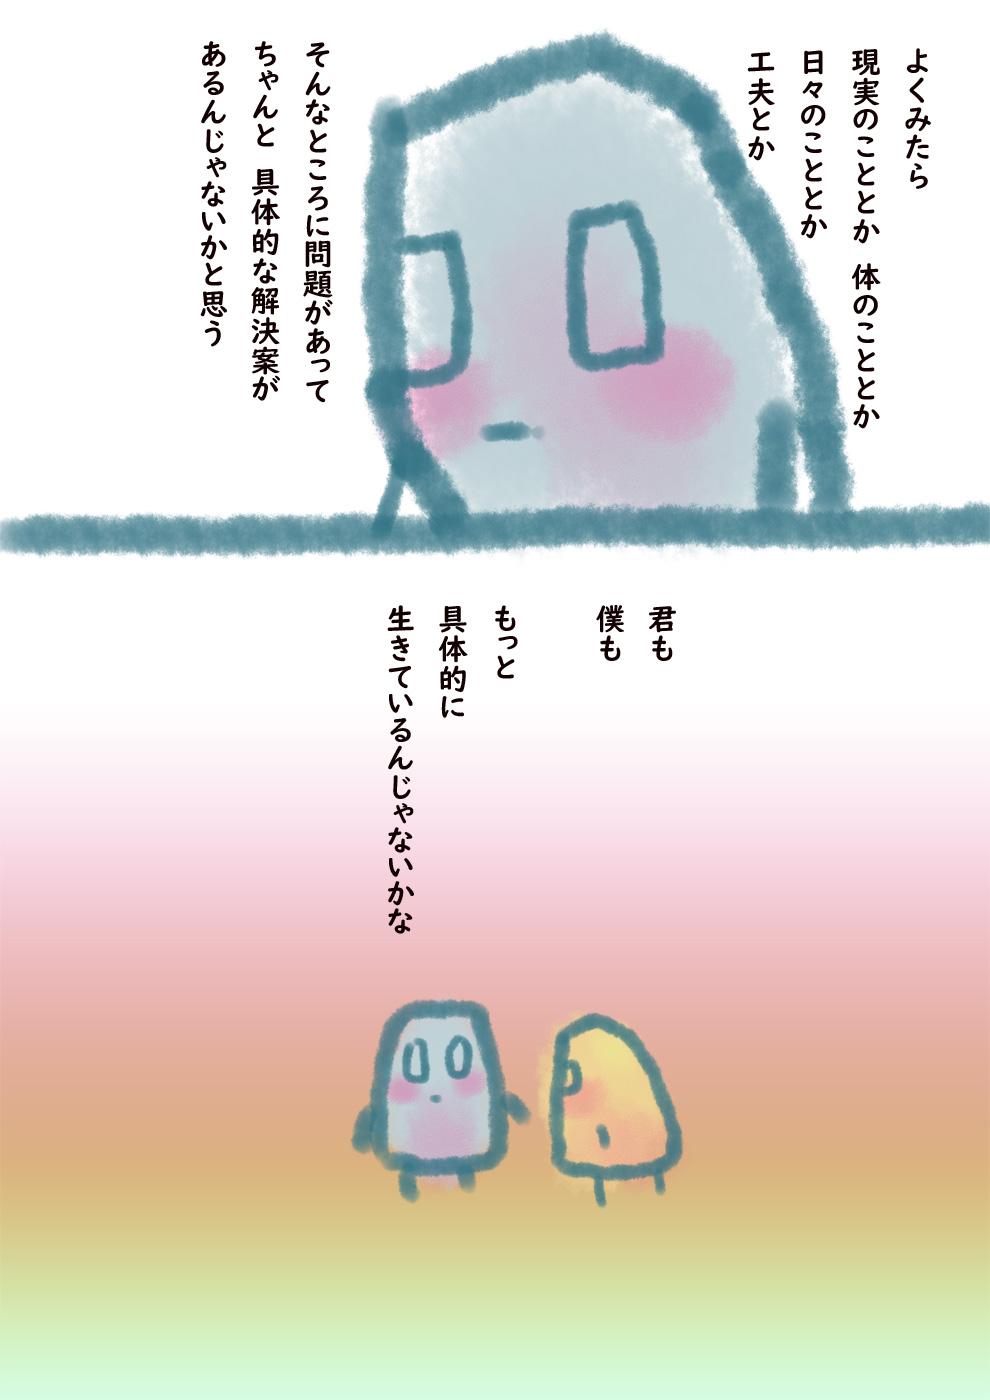 http://ahito.com/comic/short/nega/img/2018/20180312/02.jpg